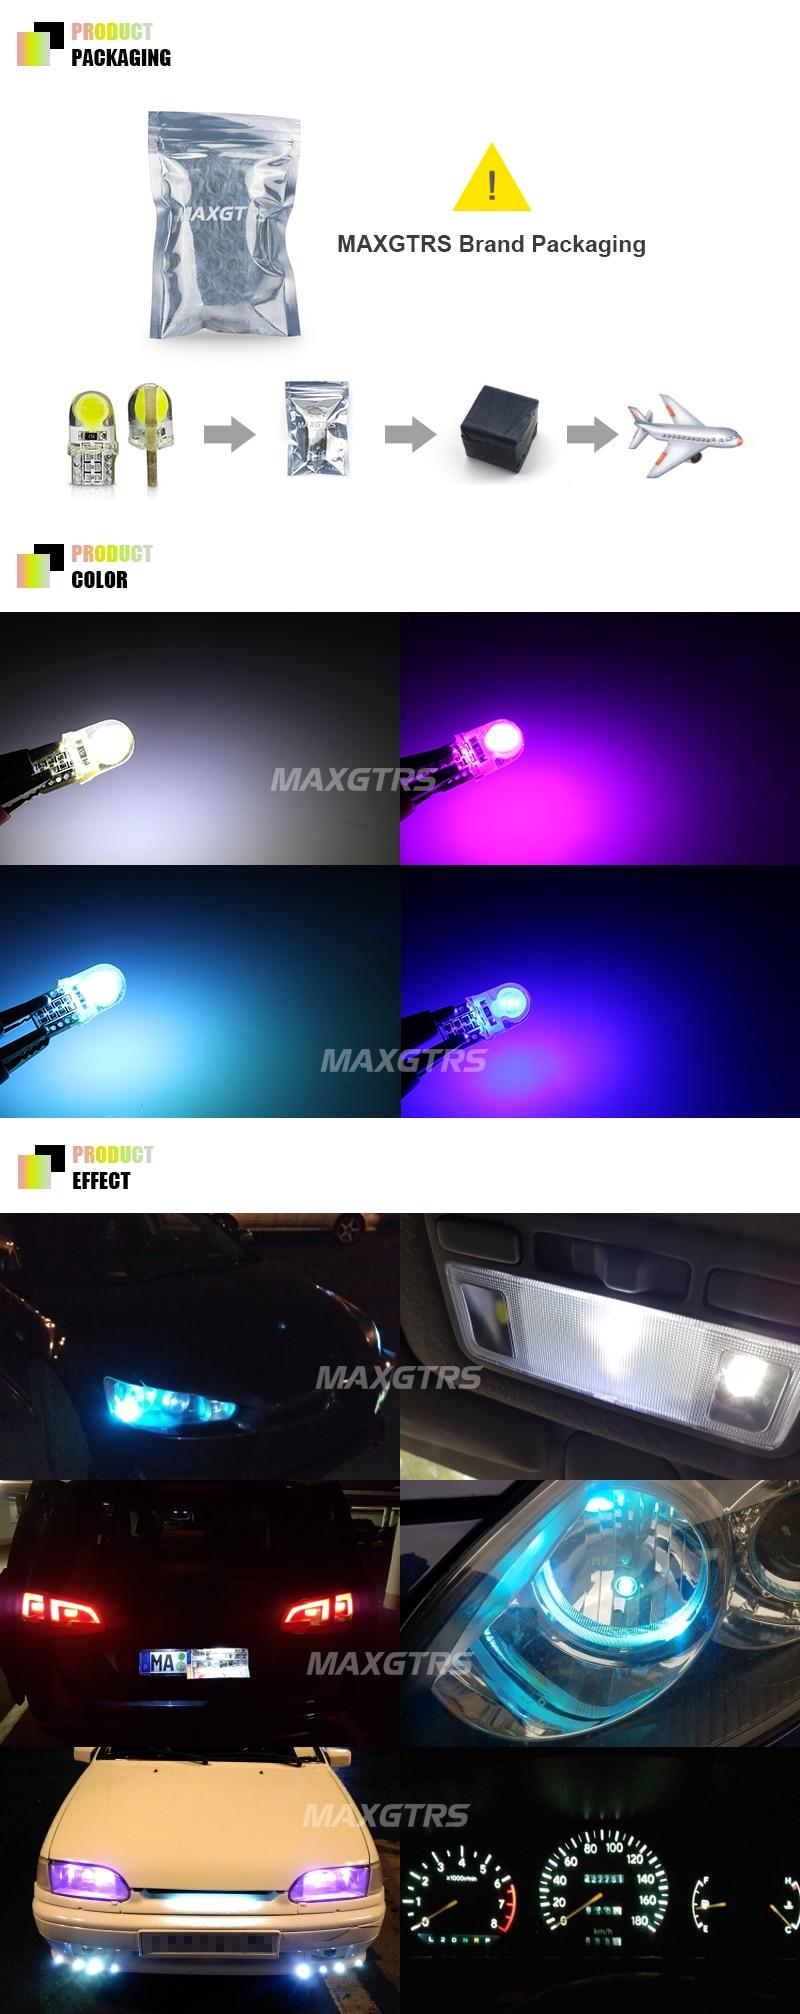 20x T10 194 W5w Mobil Led Cob Silicone Shell Auto Dome Side Lampu Silica Silokon Super Terang Wedge Cahaya Bulb Putih Biru Pink Ice Blue Sumber